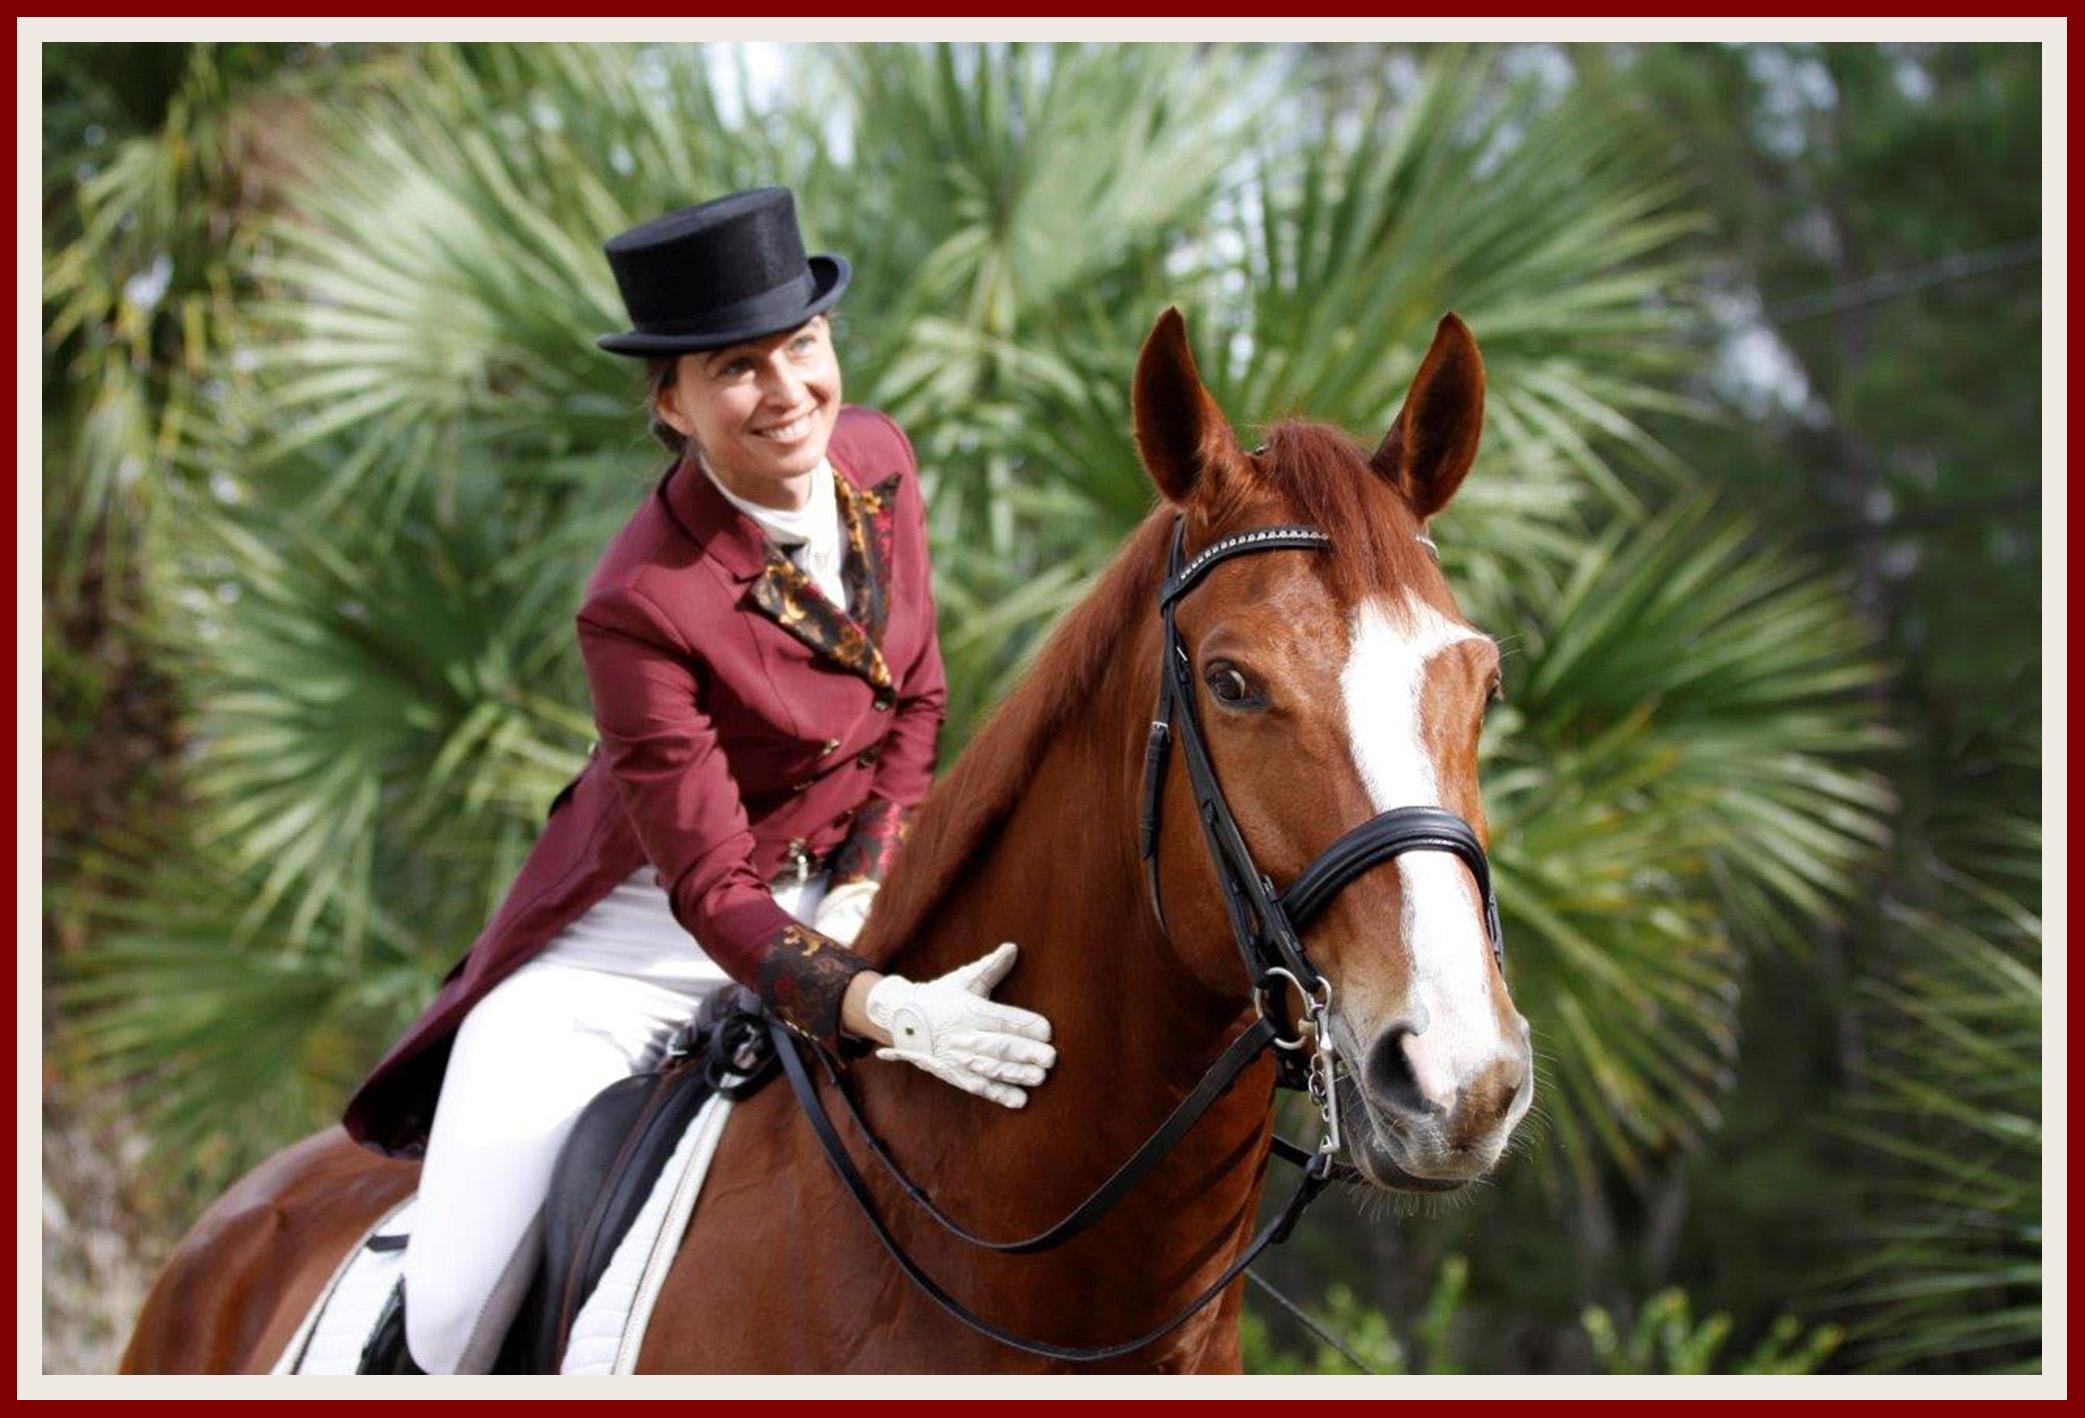 Equestrian Dressage Trainer Lana Gorski Endorses Broker Nestor Gasset